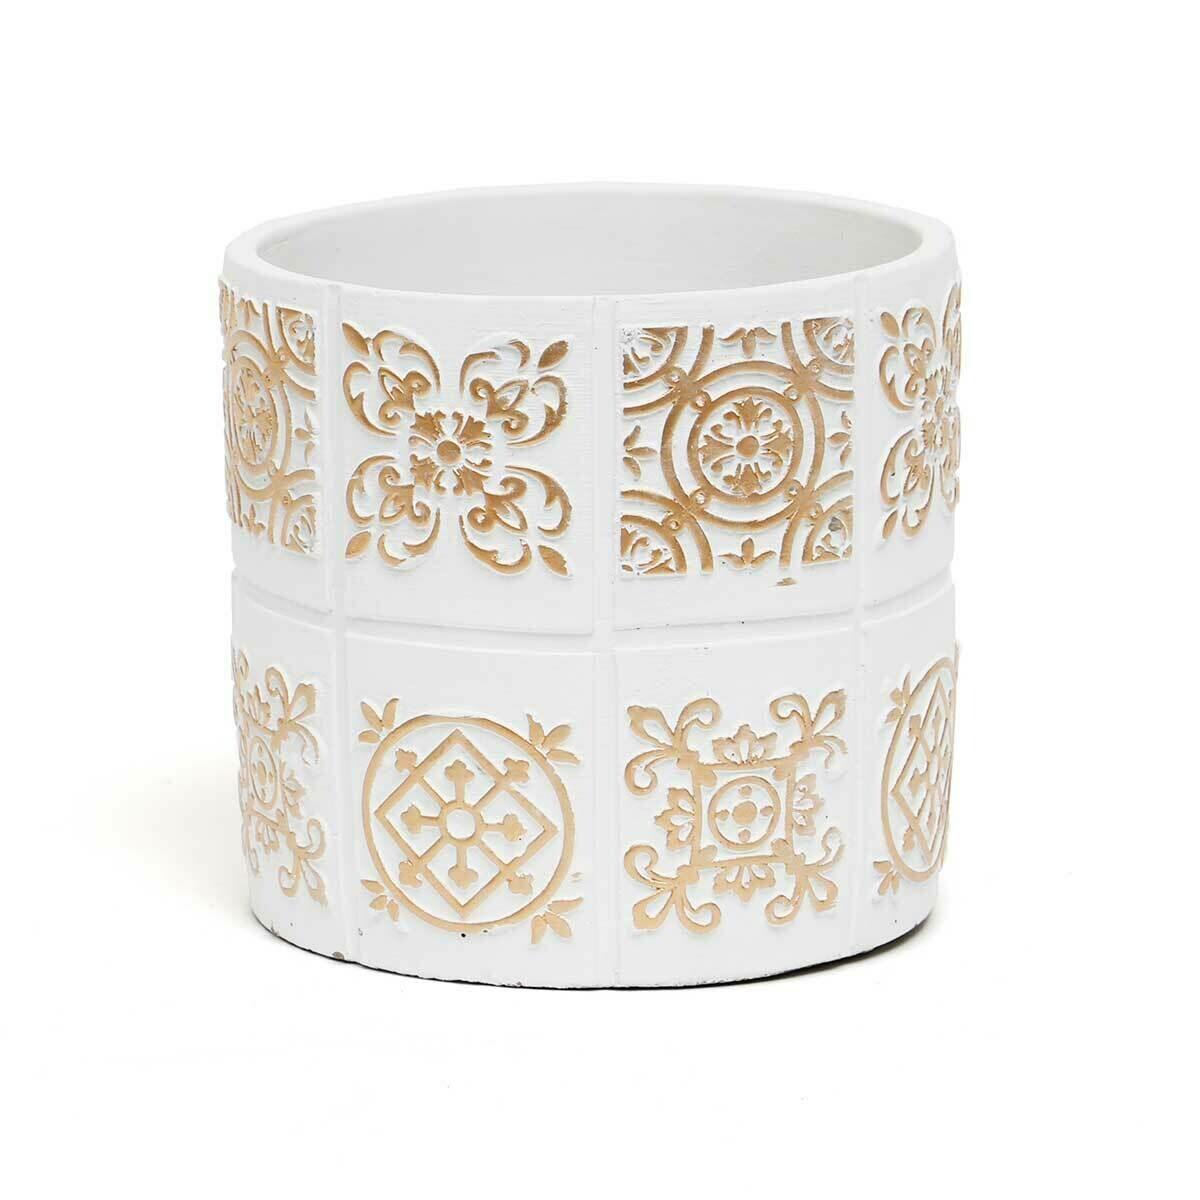 "Medallion Concrete Pot - White & Beige - Medium  - 5.75""H x 5.25""W"